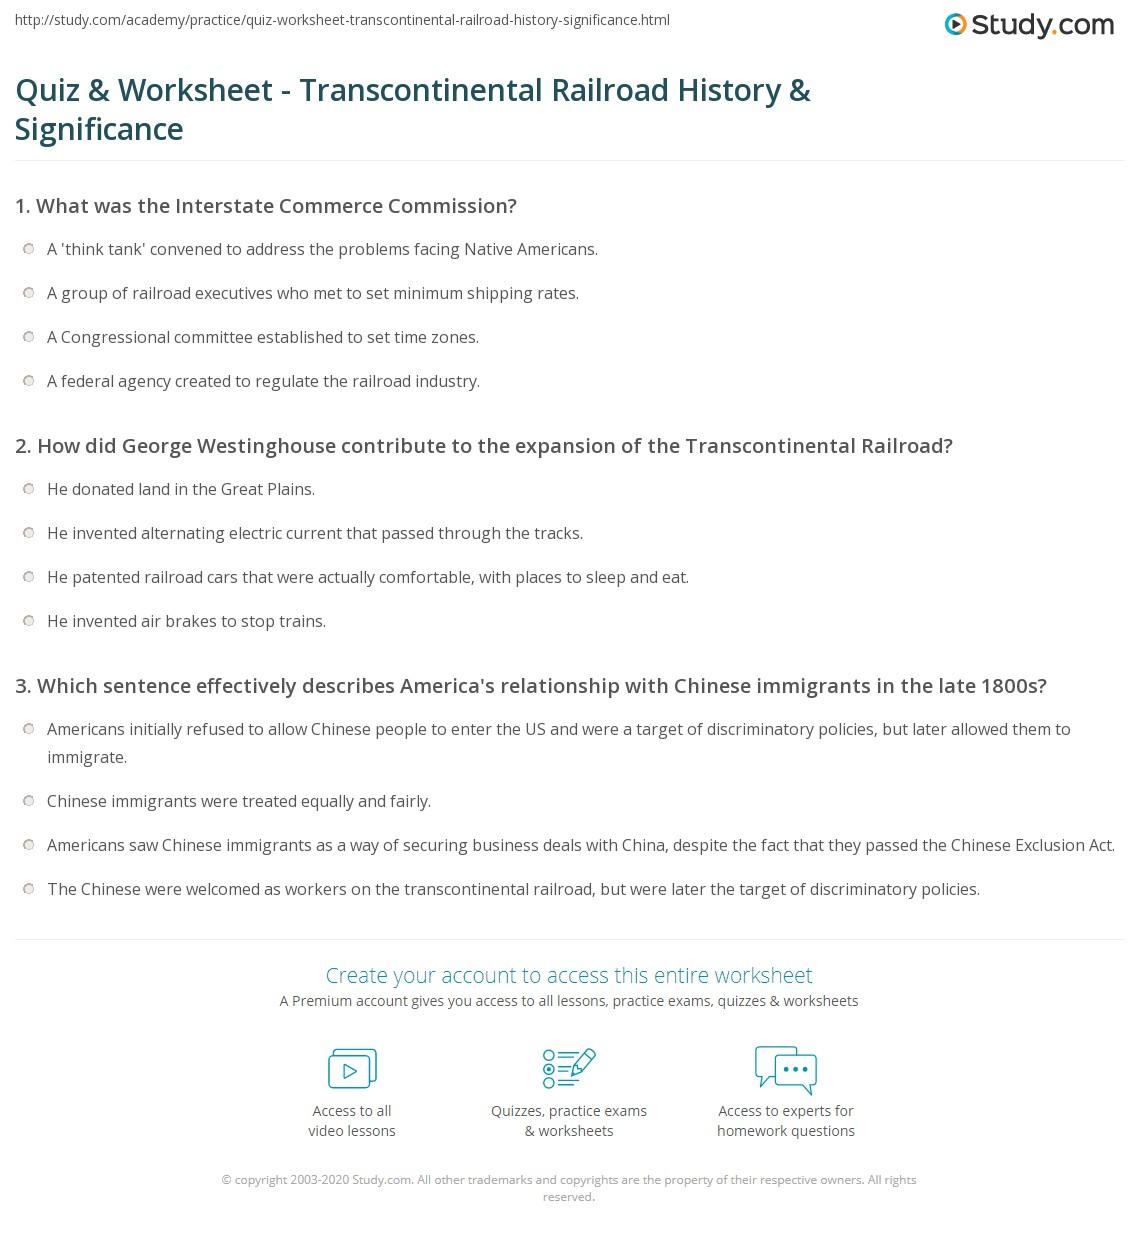 Free Worksheet 9th Grade Social Studies Worksheets transcontinental railroad worksheets rringband quiz worksheet history